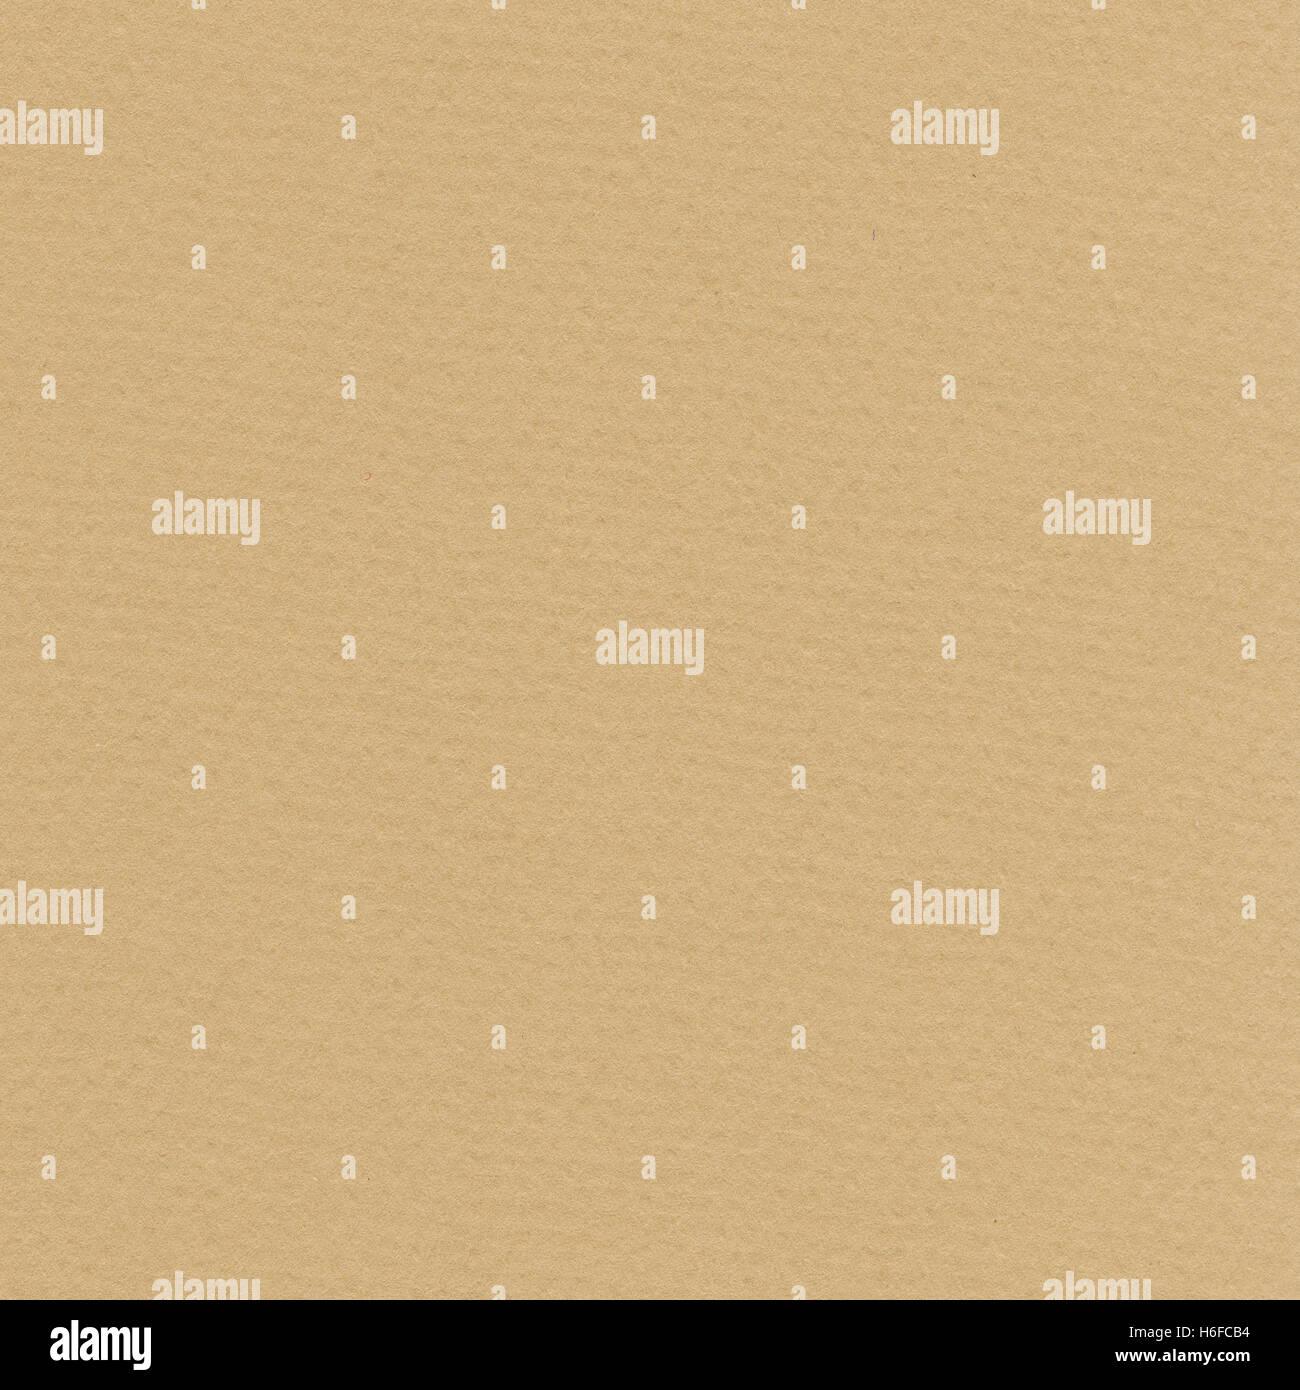 High resolution scan of beige fiber paper. Scanned at 2400dpi using a professional scanner. - Stock Image